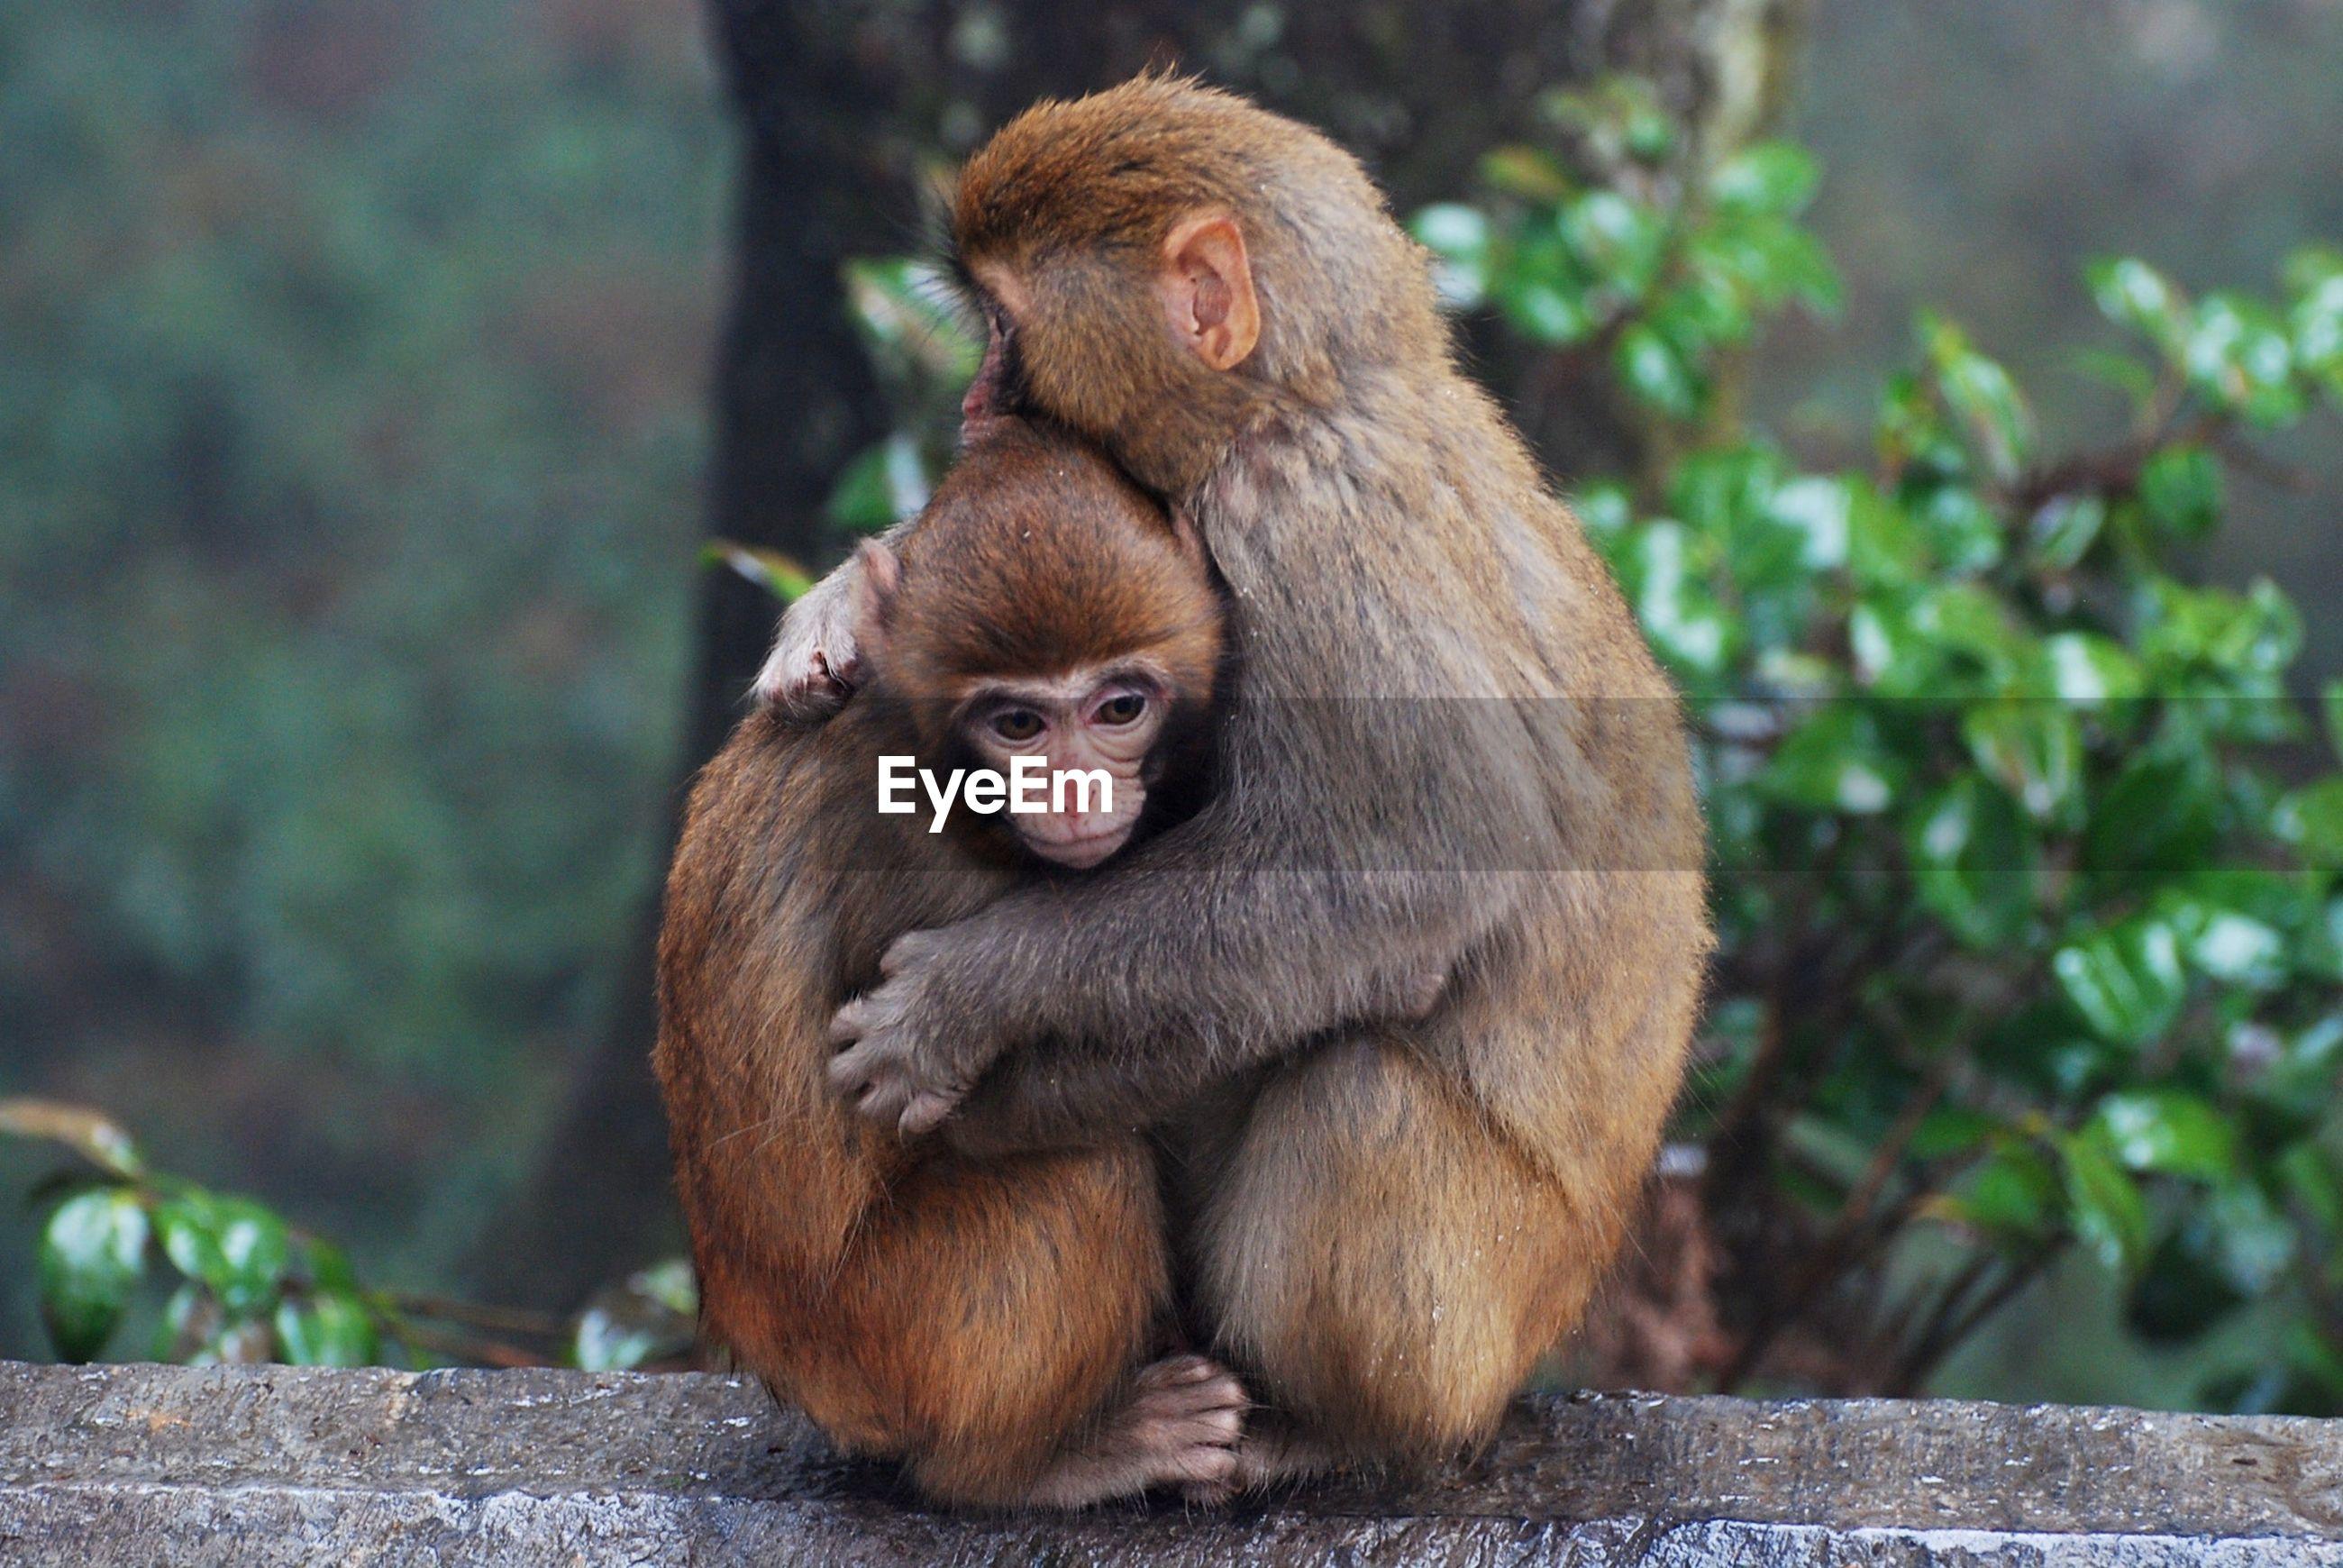 Monkeys hugging on railing